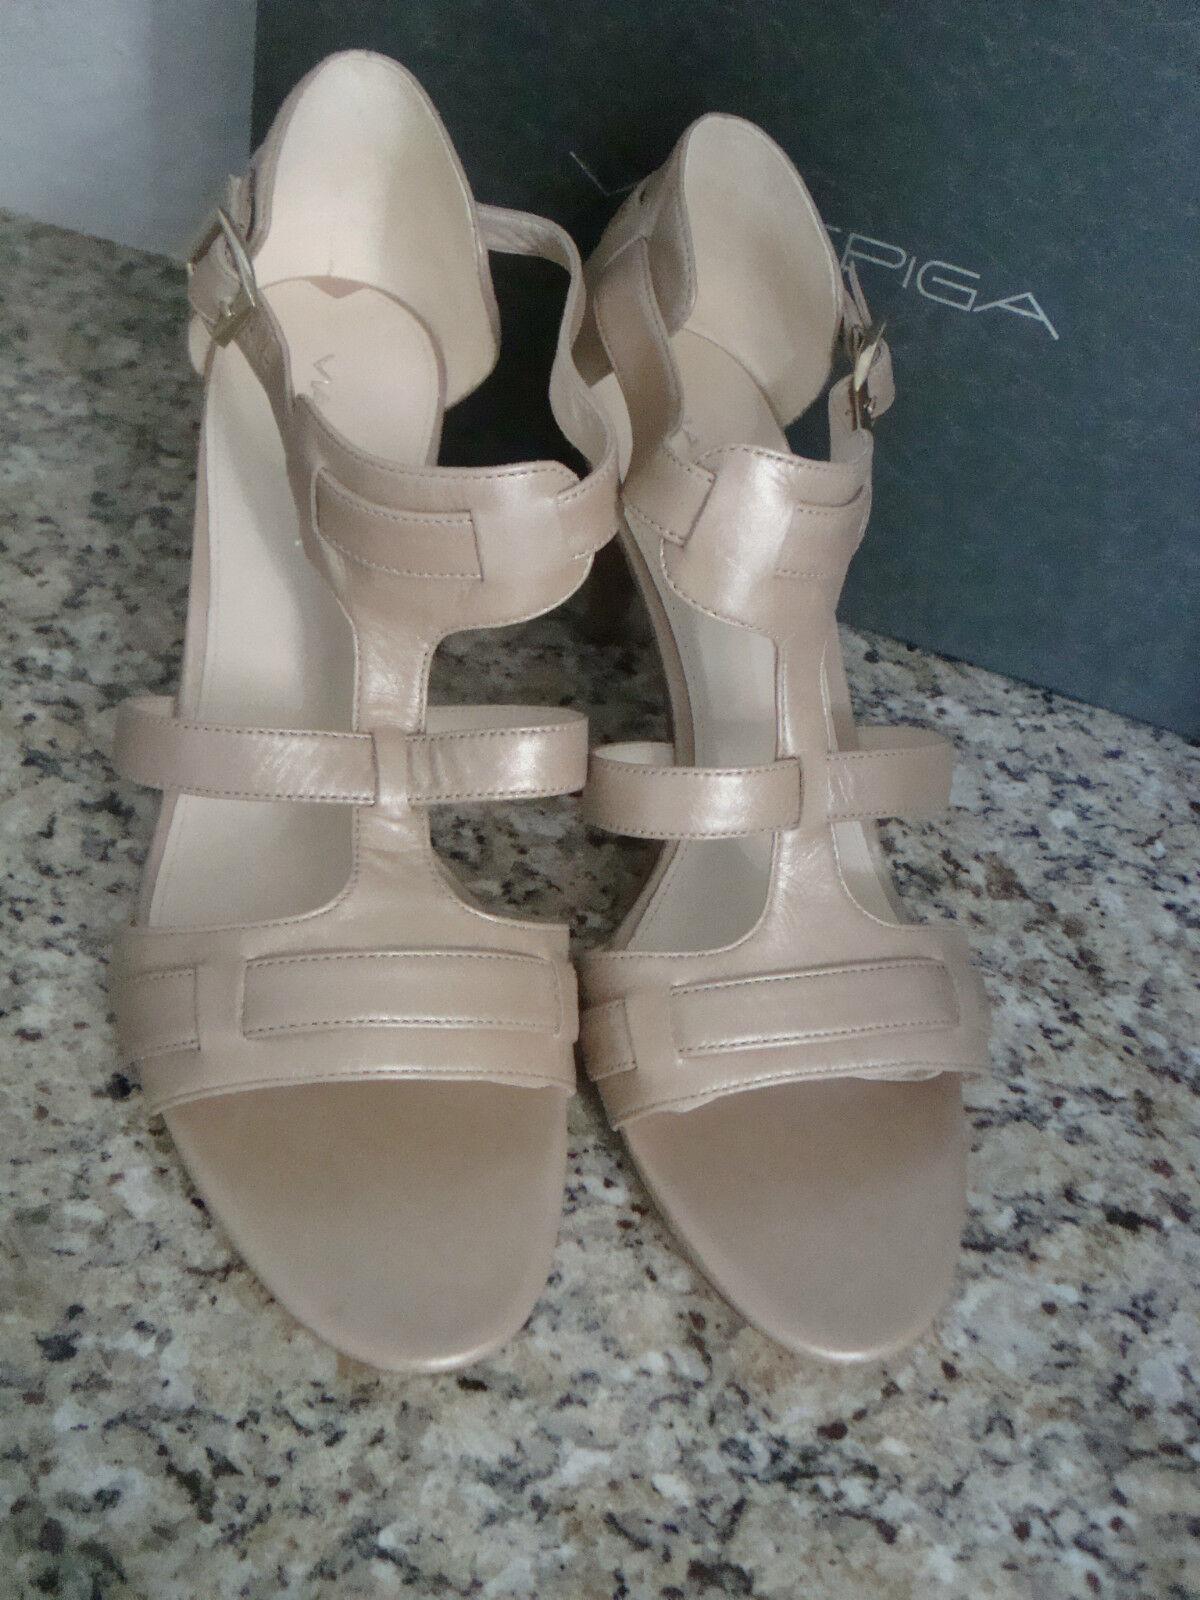 Via Spiga NEU Damenschuhe Hilda Pearl Calf Platform Heels 10 M Schuhes